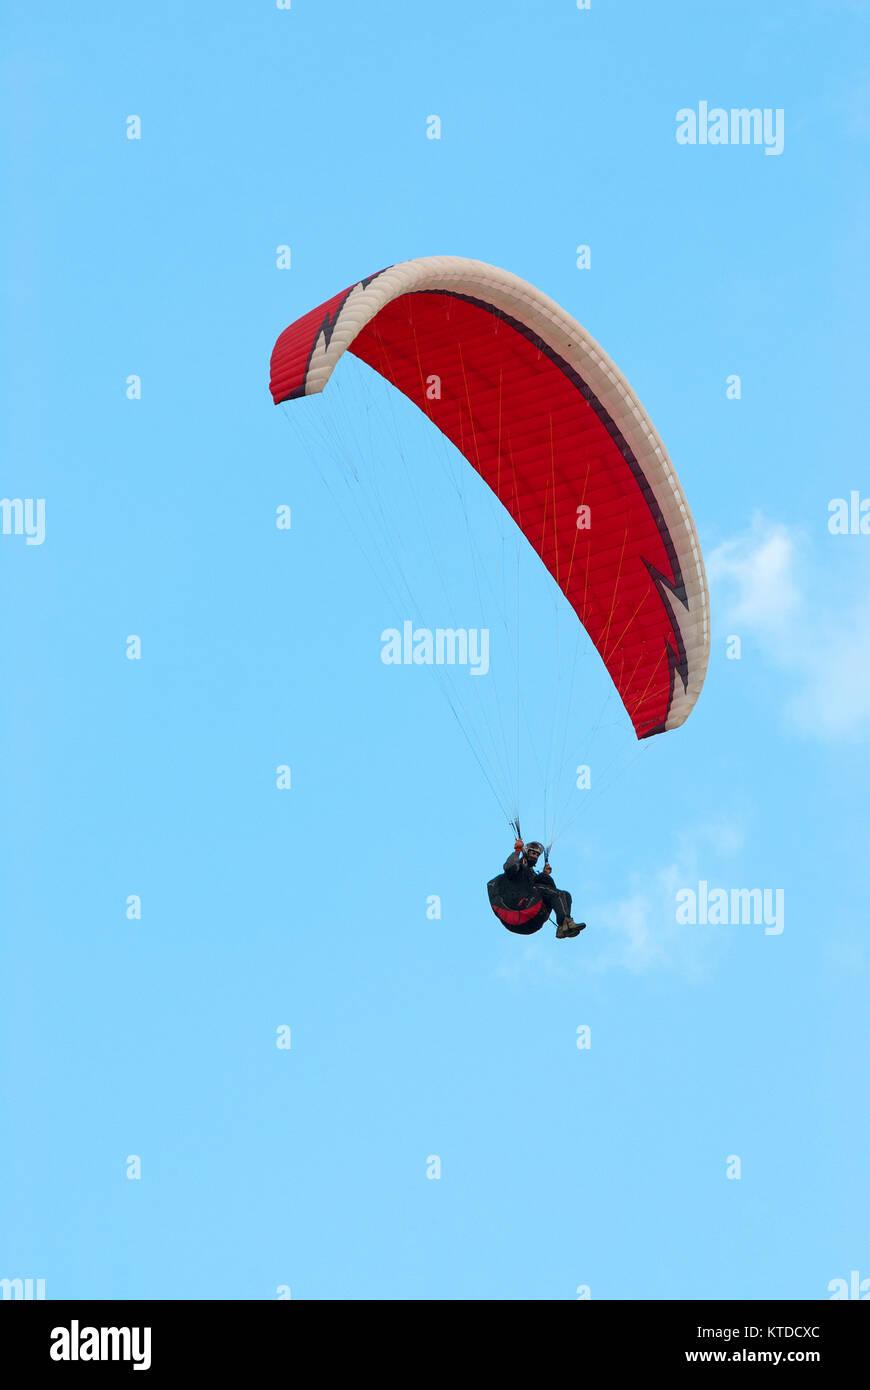 Paragliding in Castelluccio di Norcia, Sibillini Mountains National Park, Umbria, Italy - Stock Image